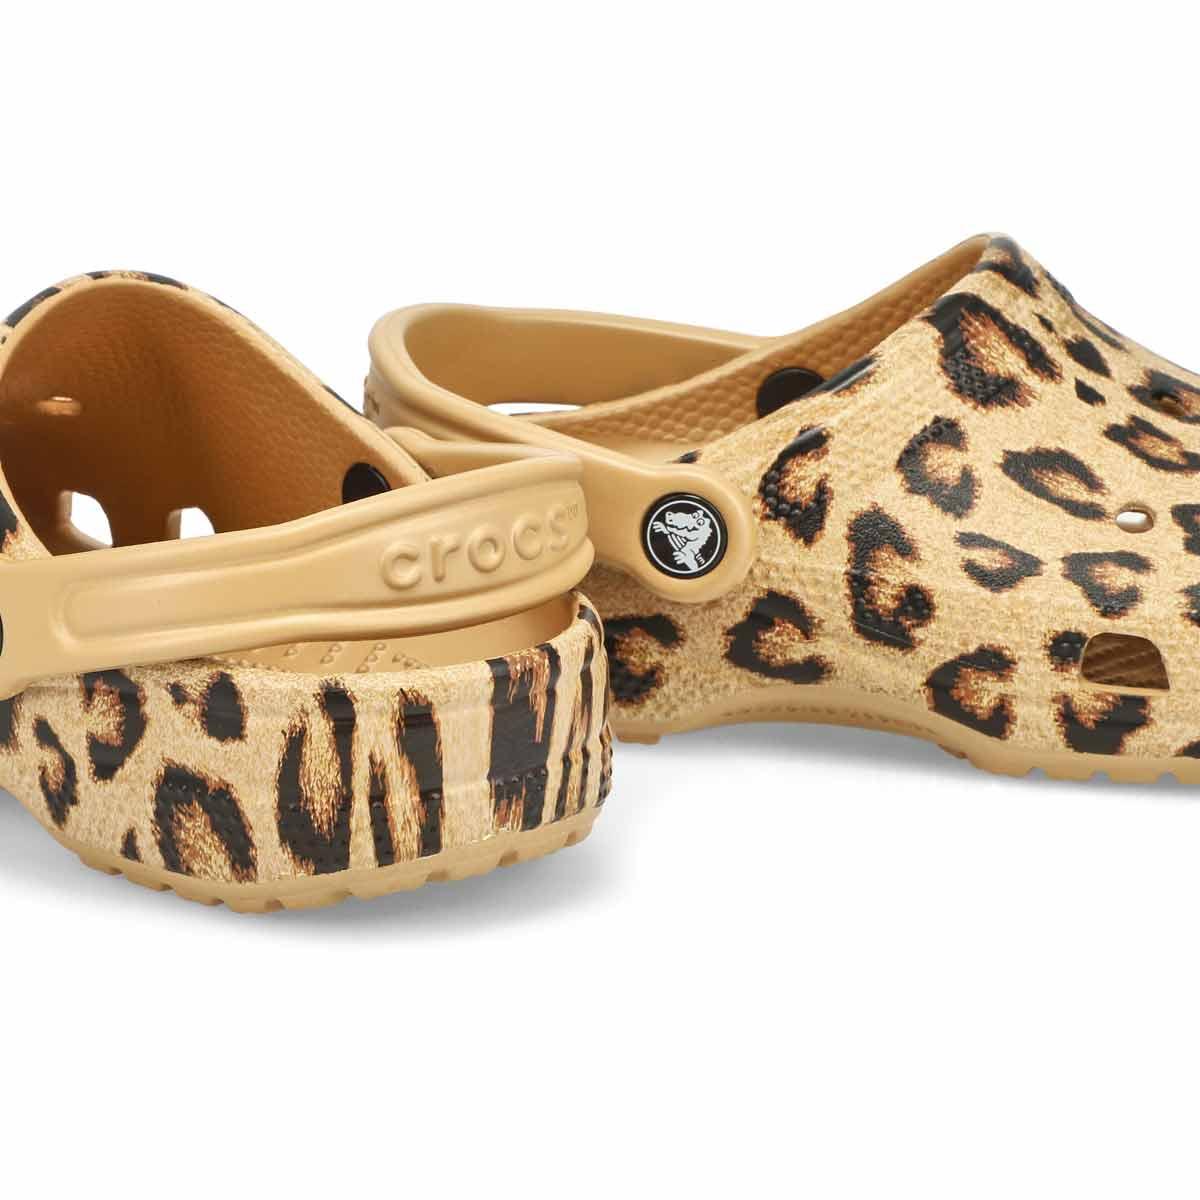 Women's Classic Printed Clog - Leopard/Gold